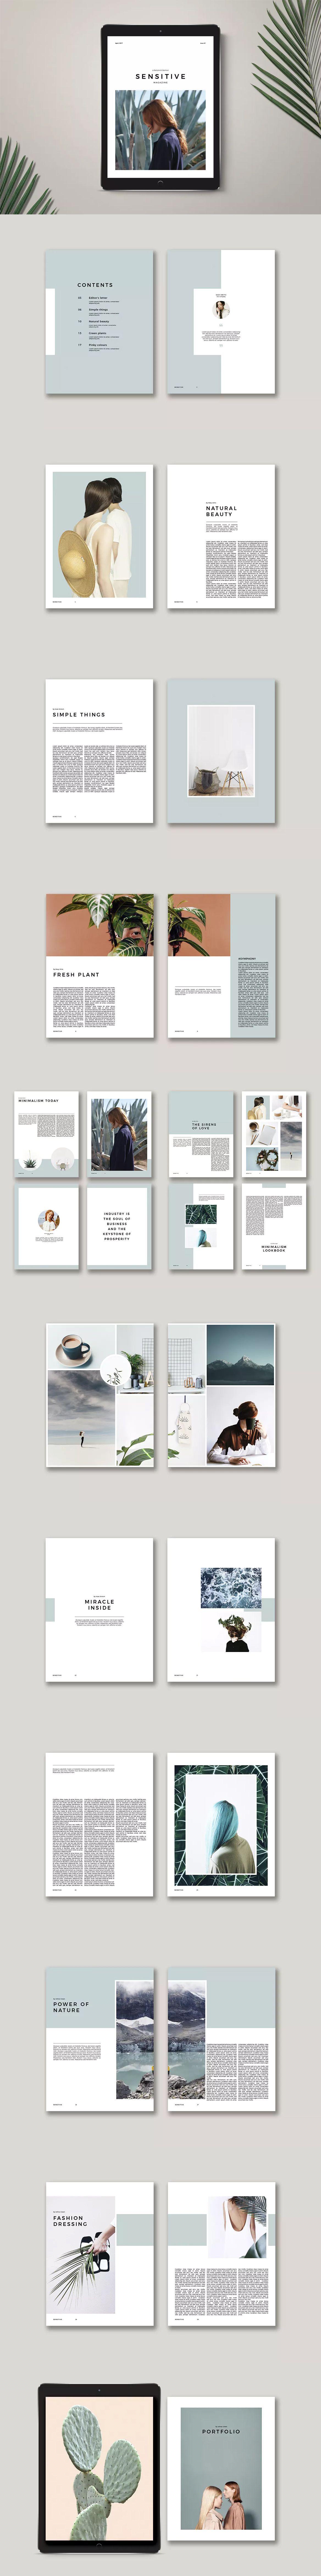 Sensitive E-Magazine Template InDesign INDD | Editorial | Pinterest ...